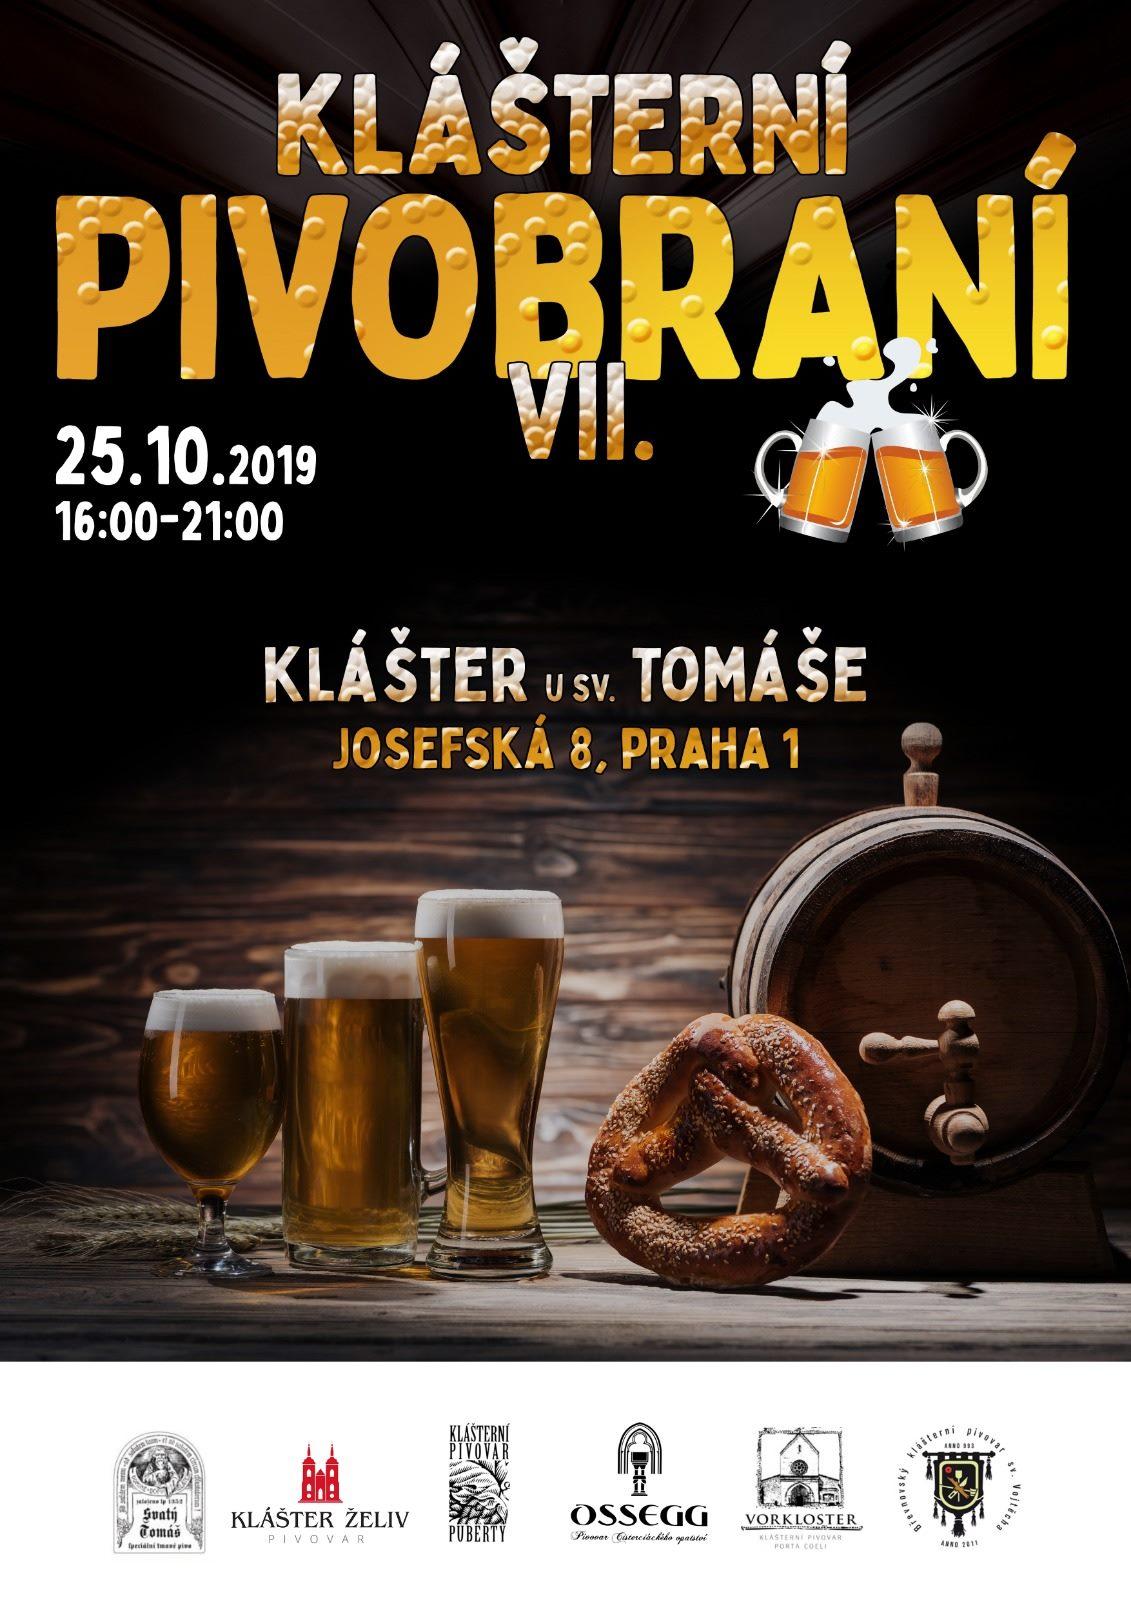 pivovari-pivovary-pivni-akce-klasterni-pivobrani-praha-2019